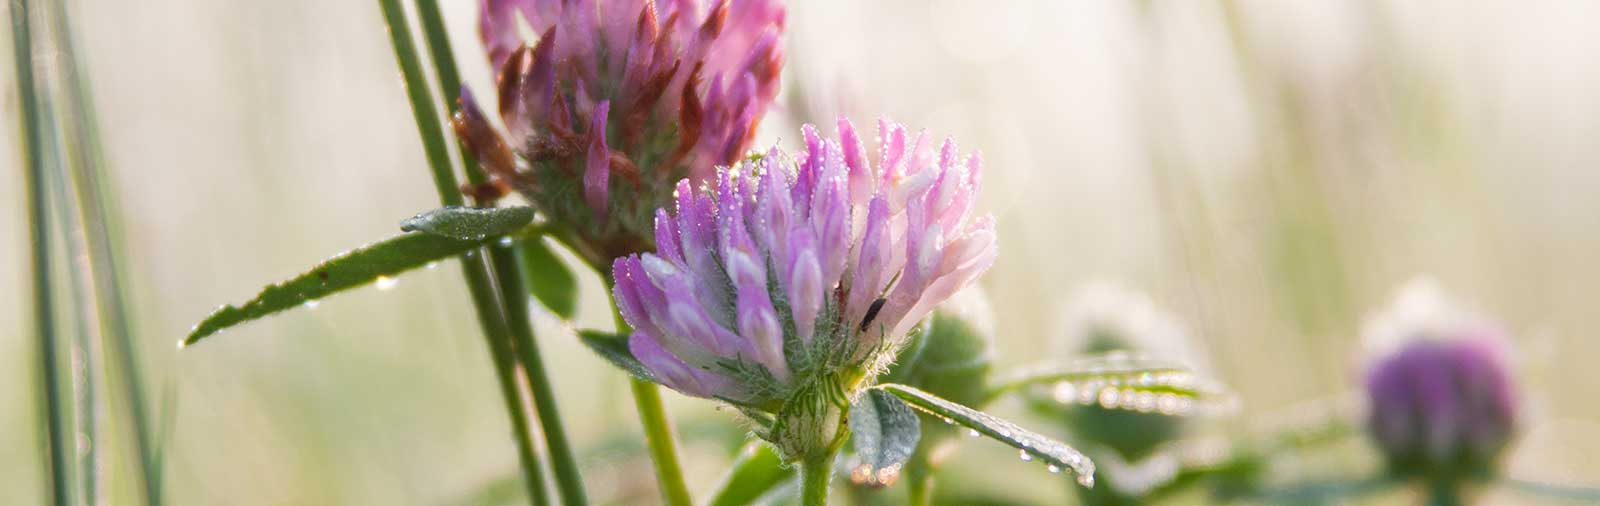 Rotklee - Trifolium pratense L.